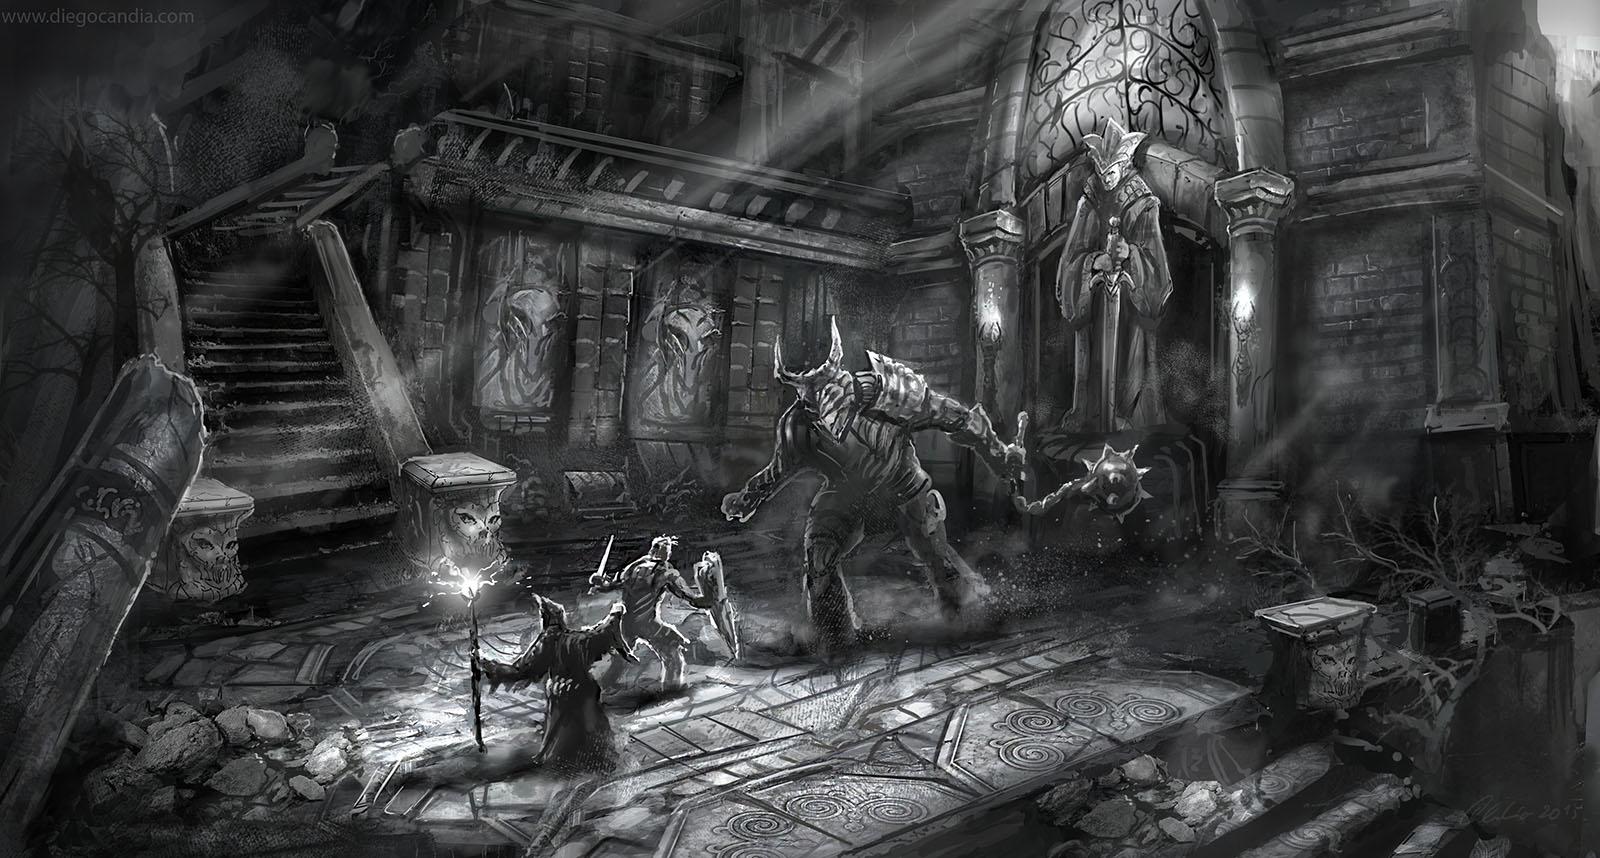 Dungeon_art.jpg